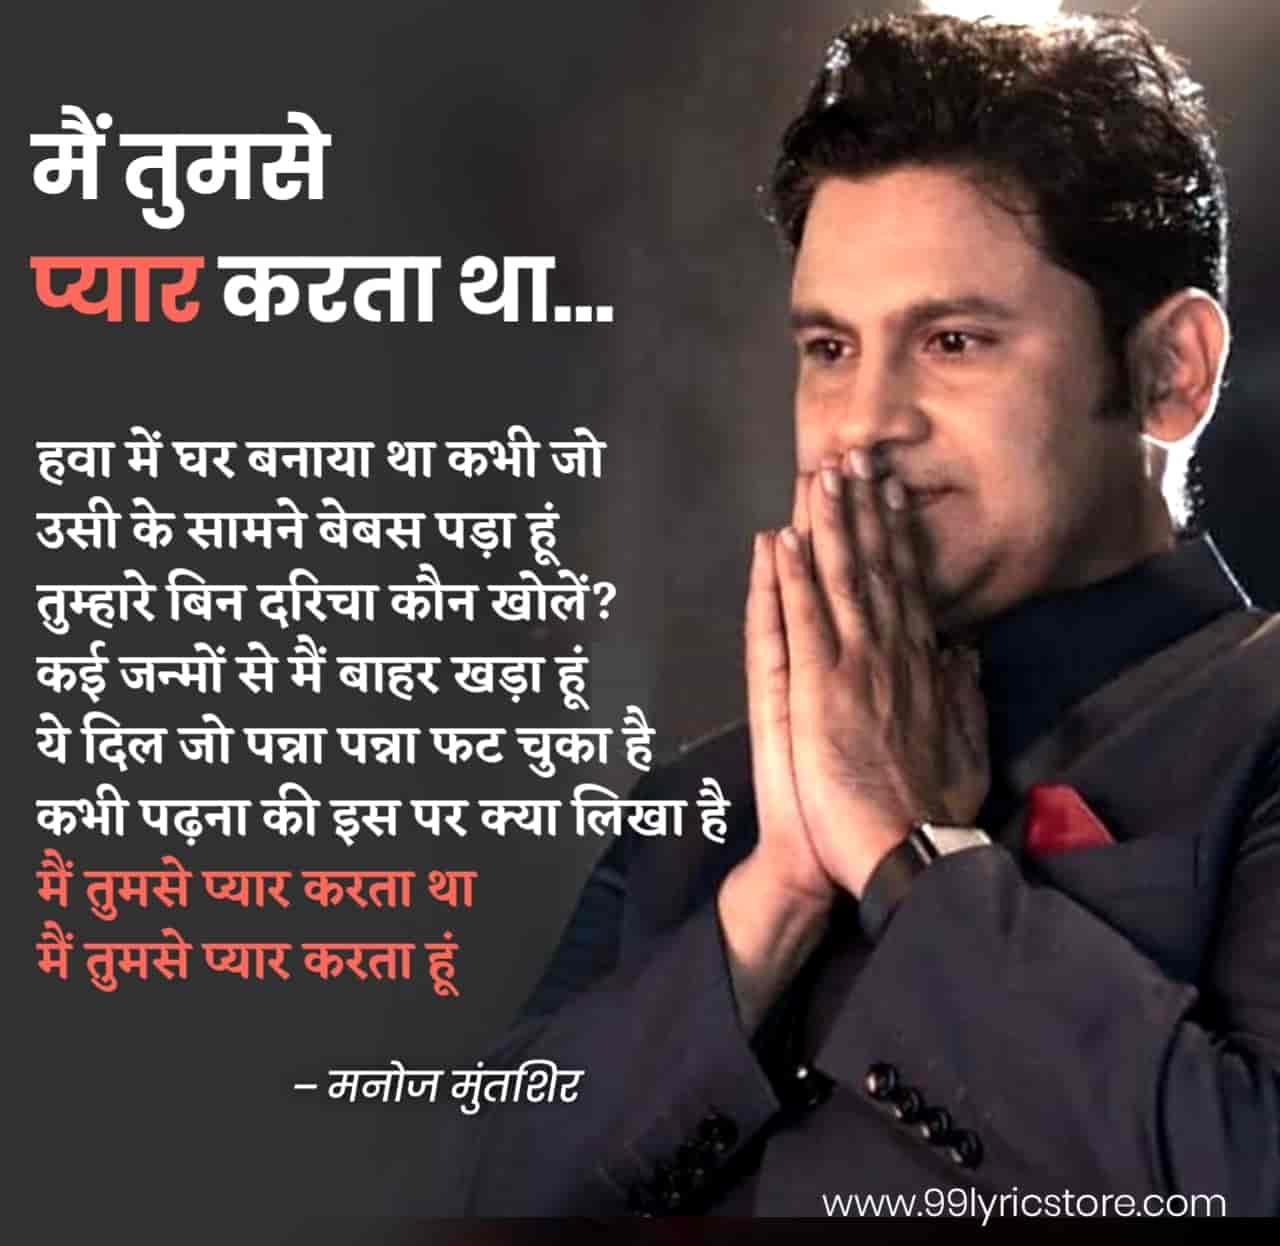 Main Tumse Pyar Karta Tha Poetry Poem Image By Manoj Muntashir